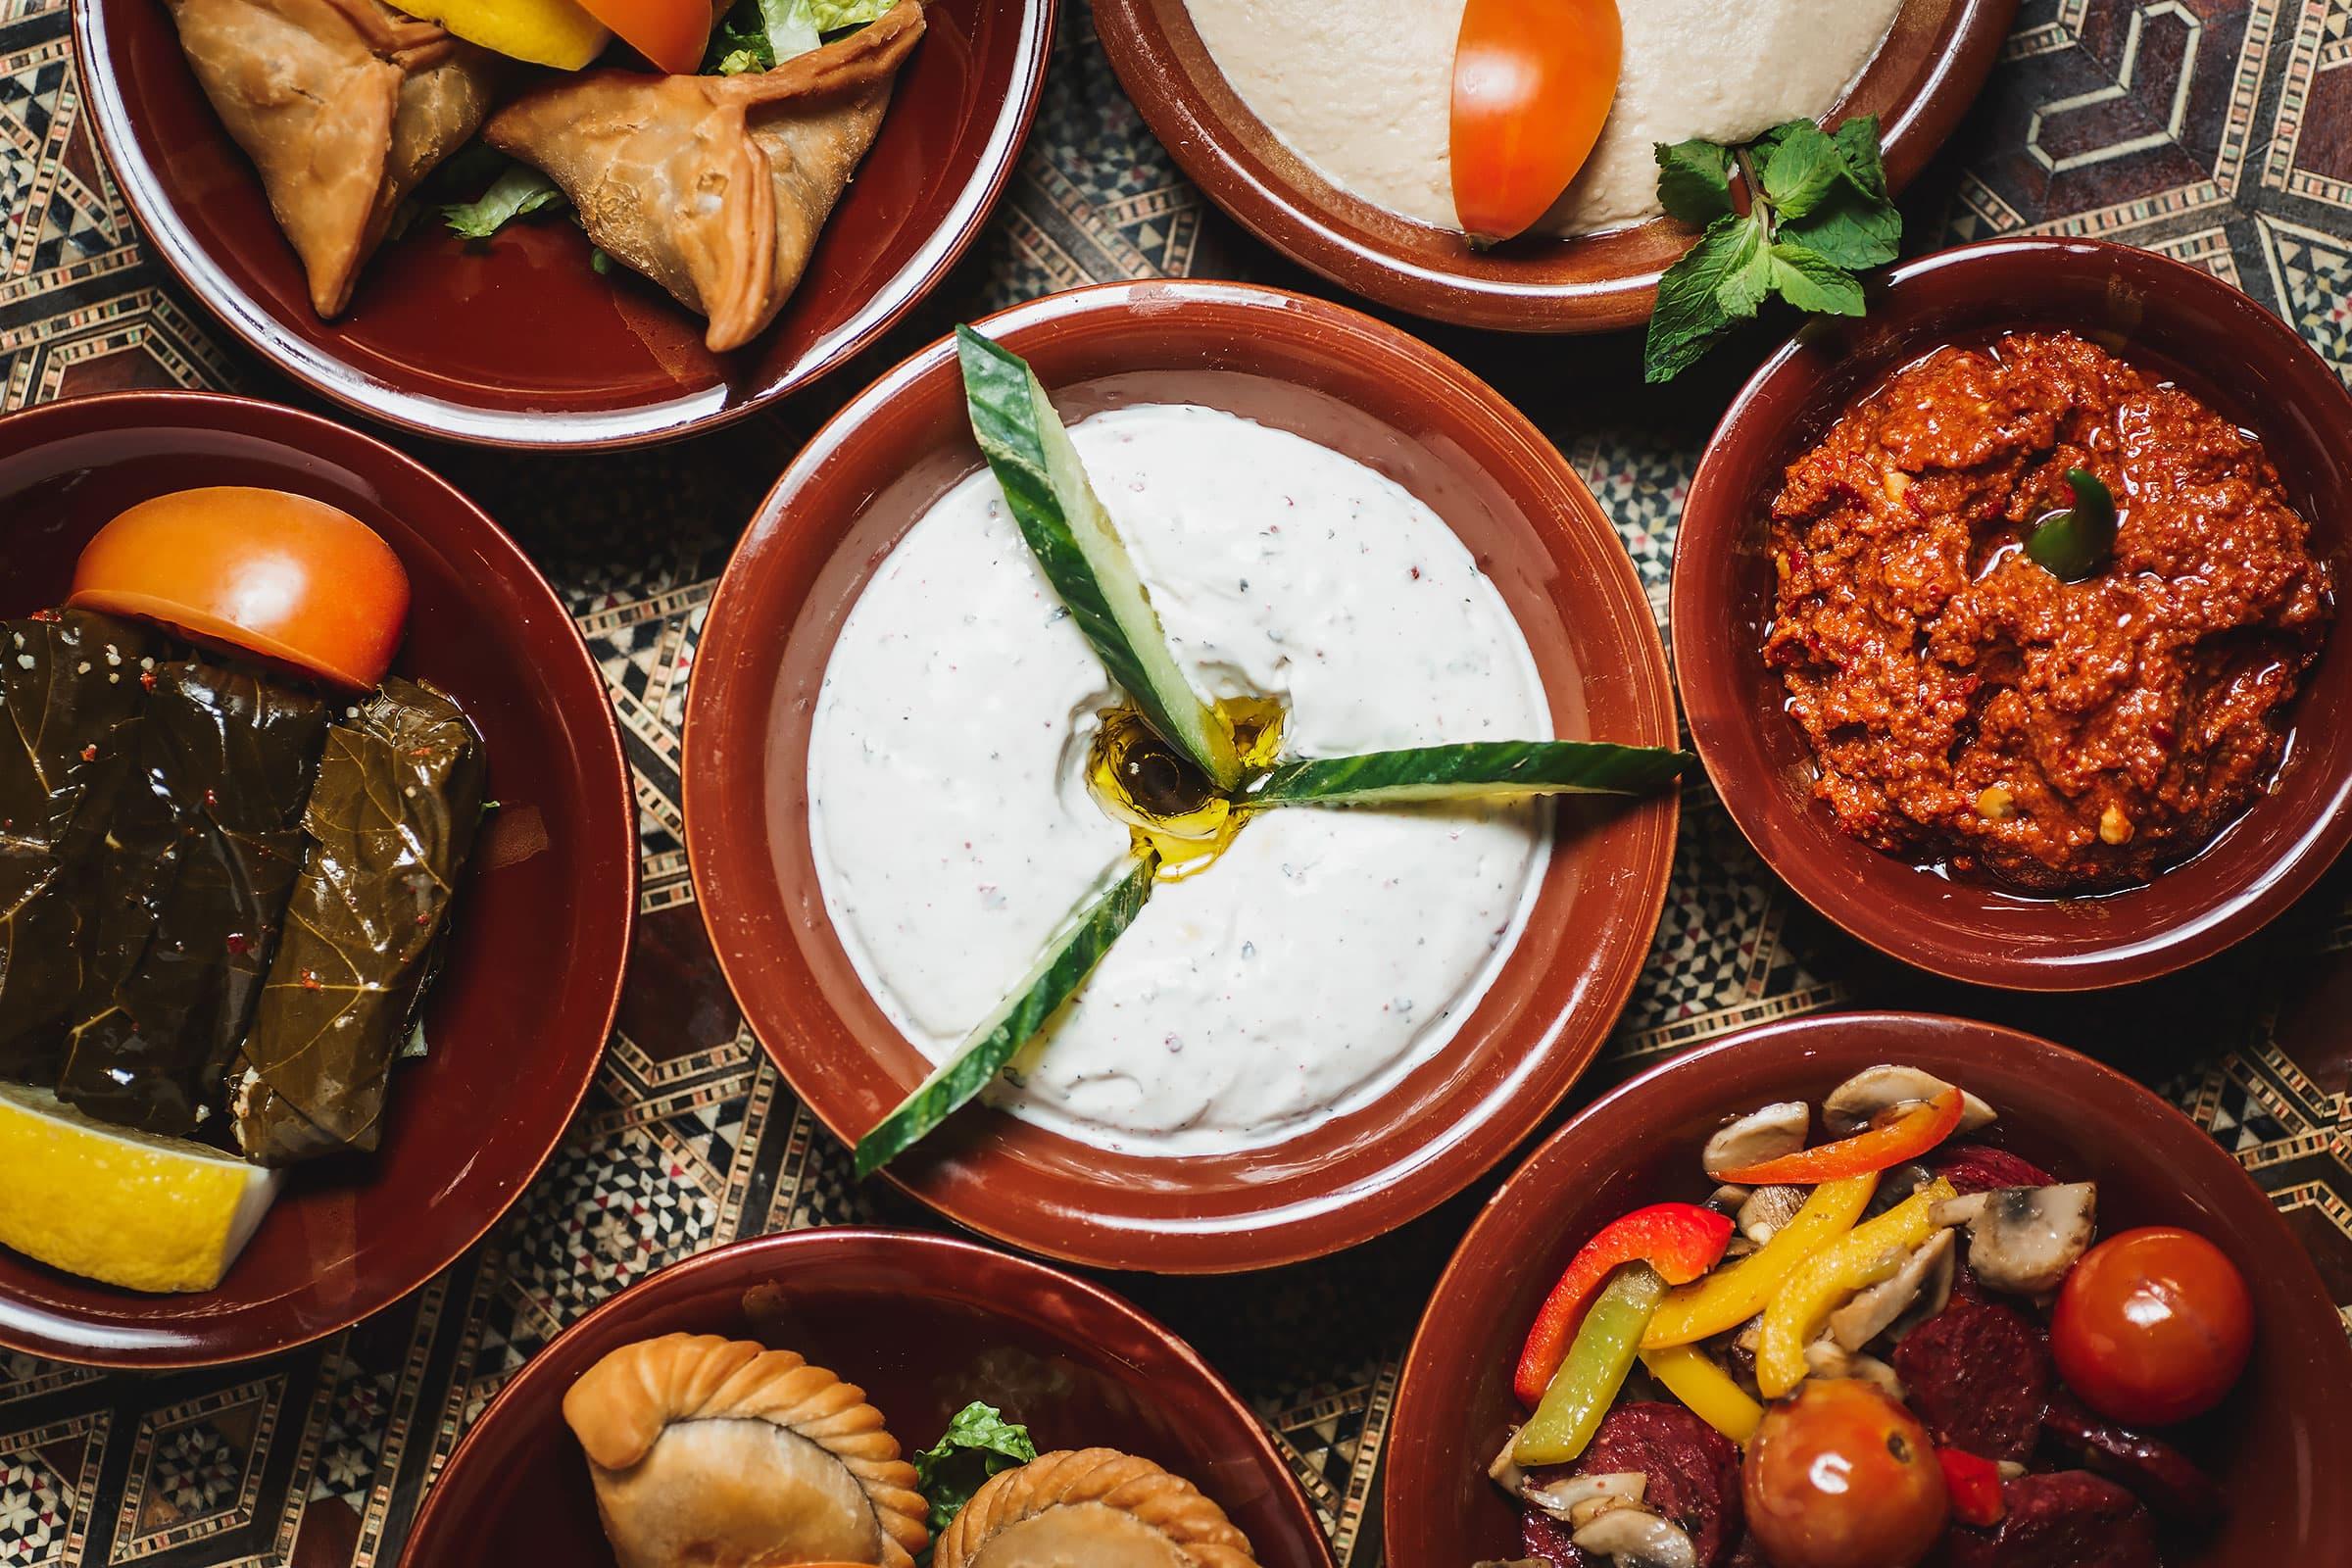 libanesisk mat söder